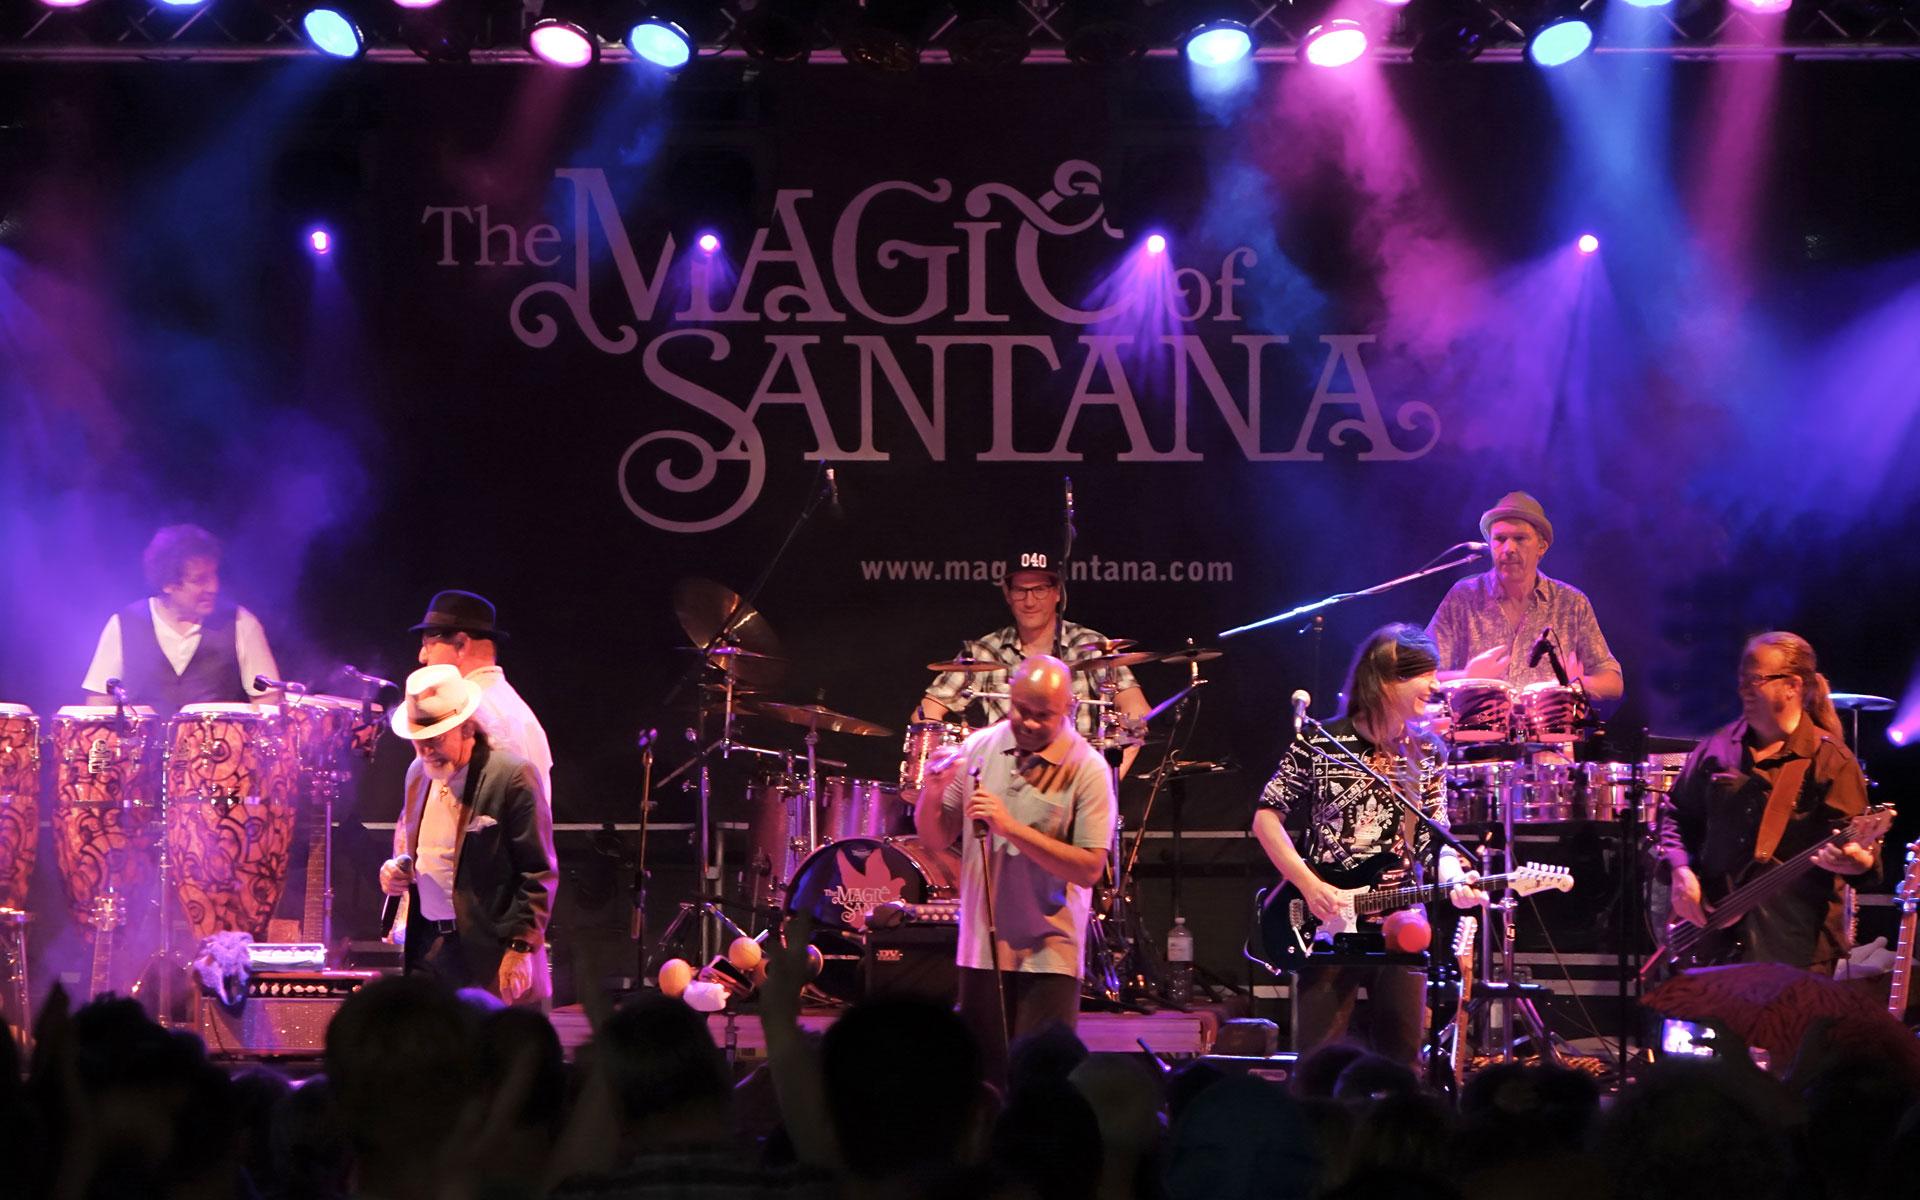 Konzert mit Santana